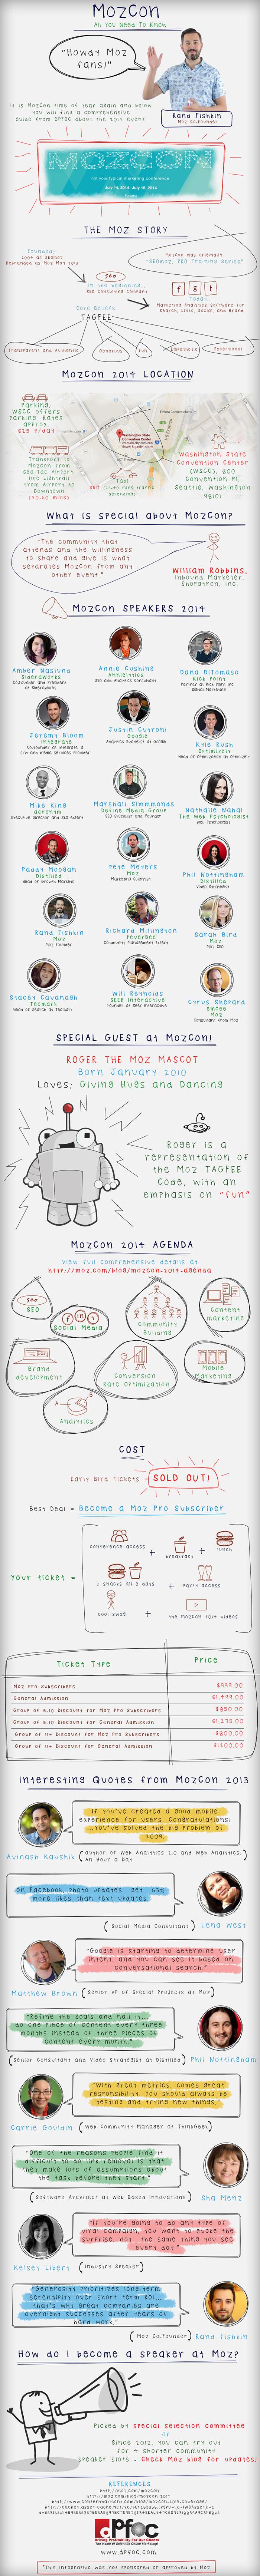 2014 MozCon